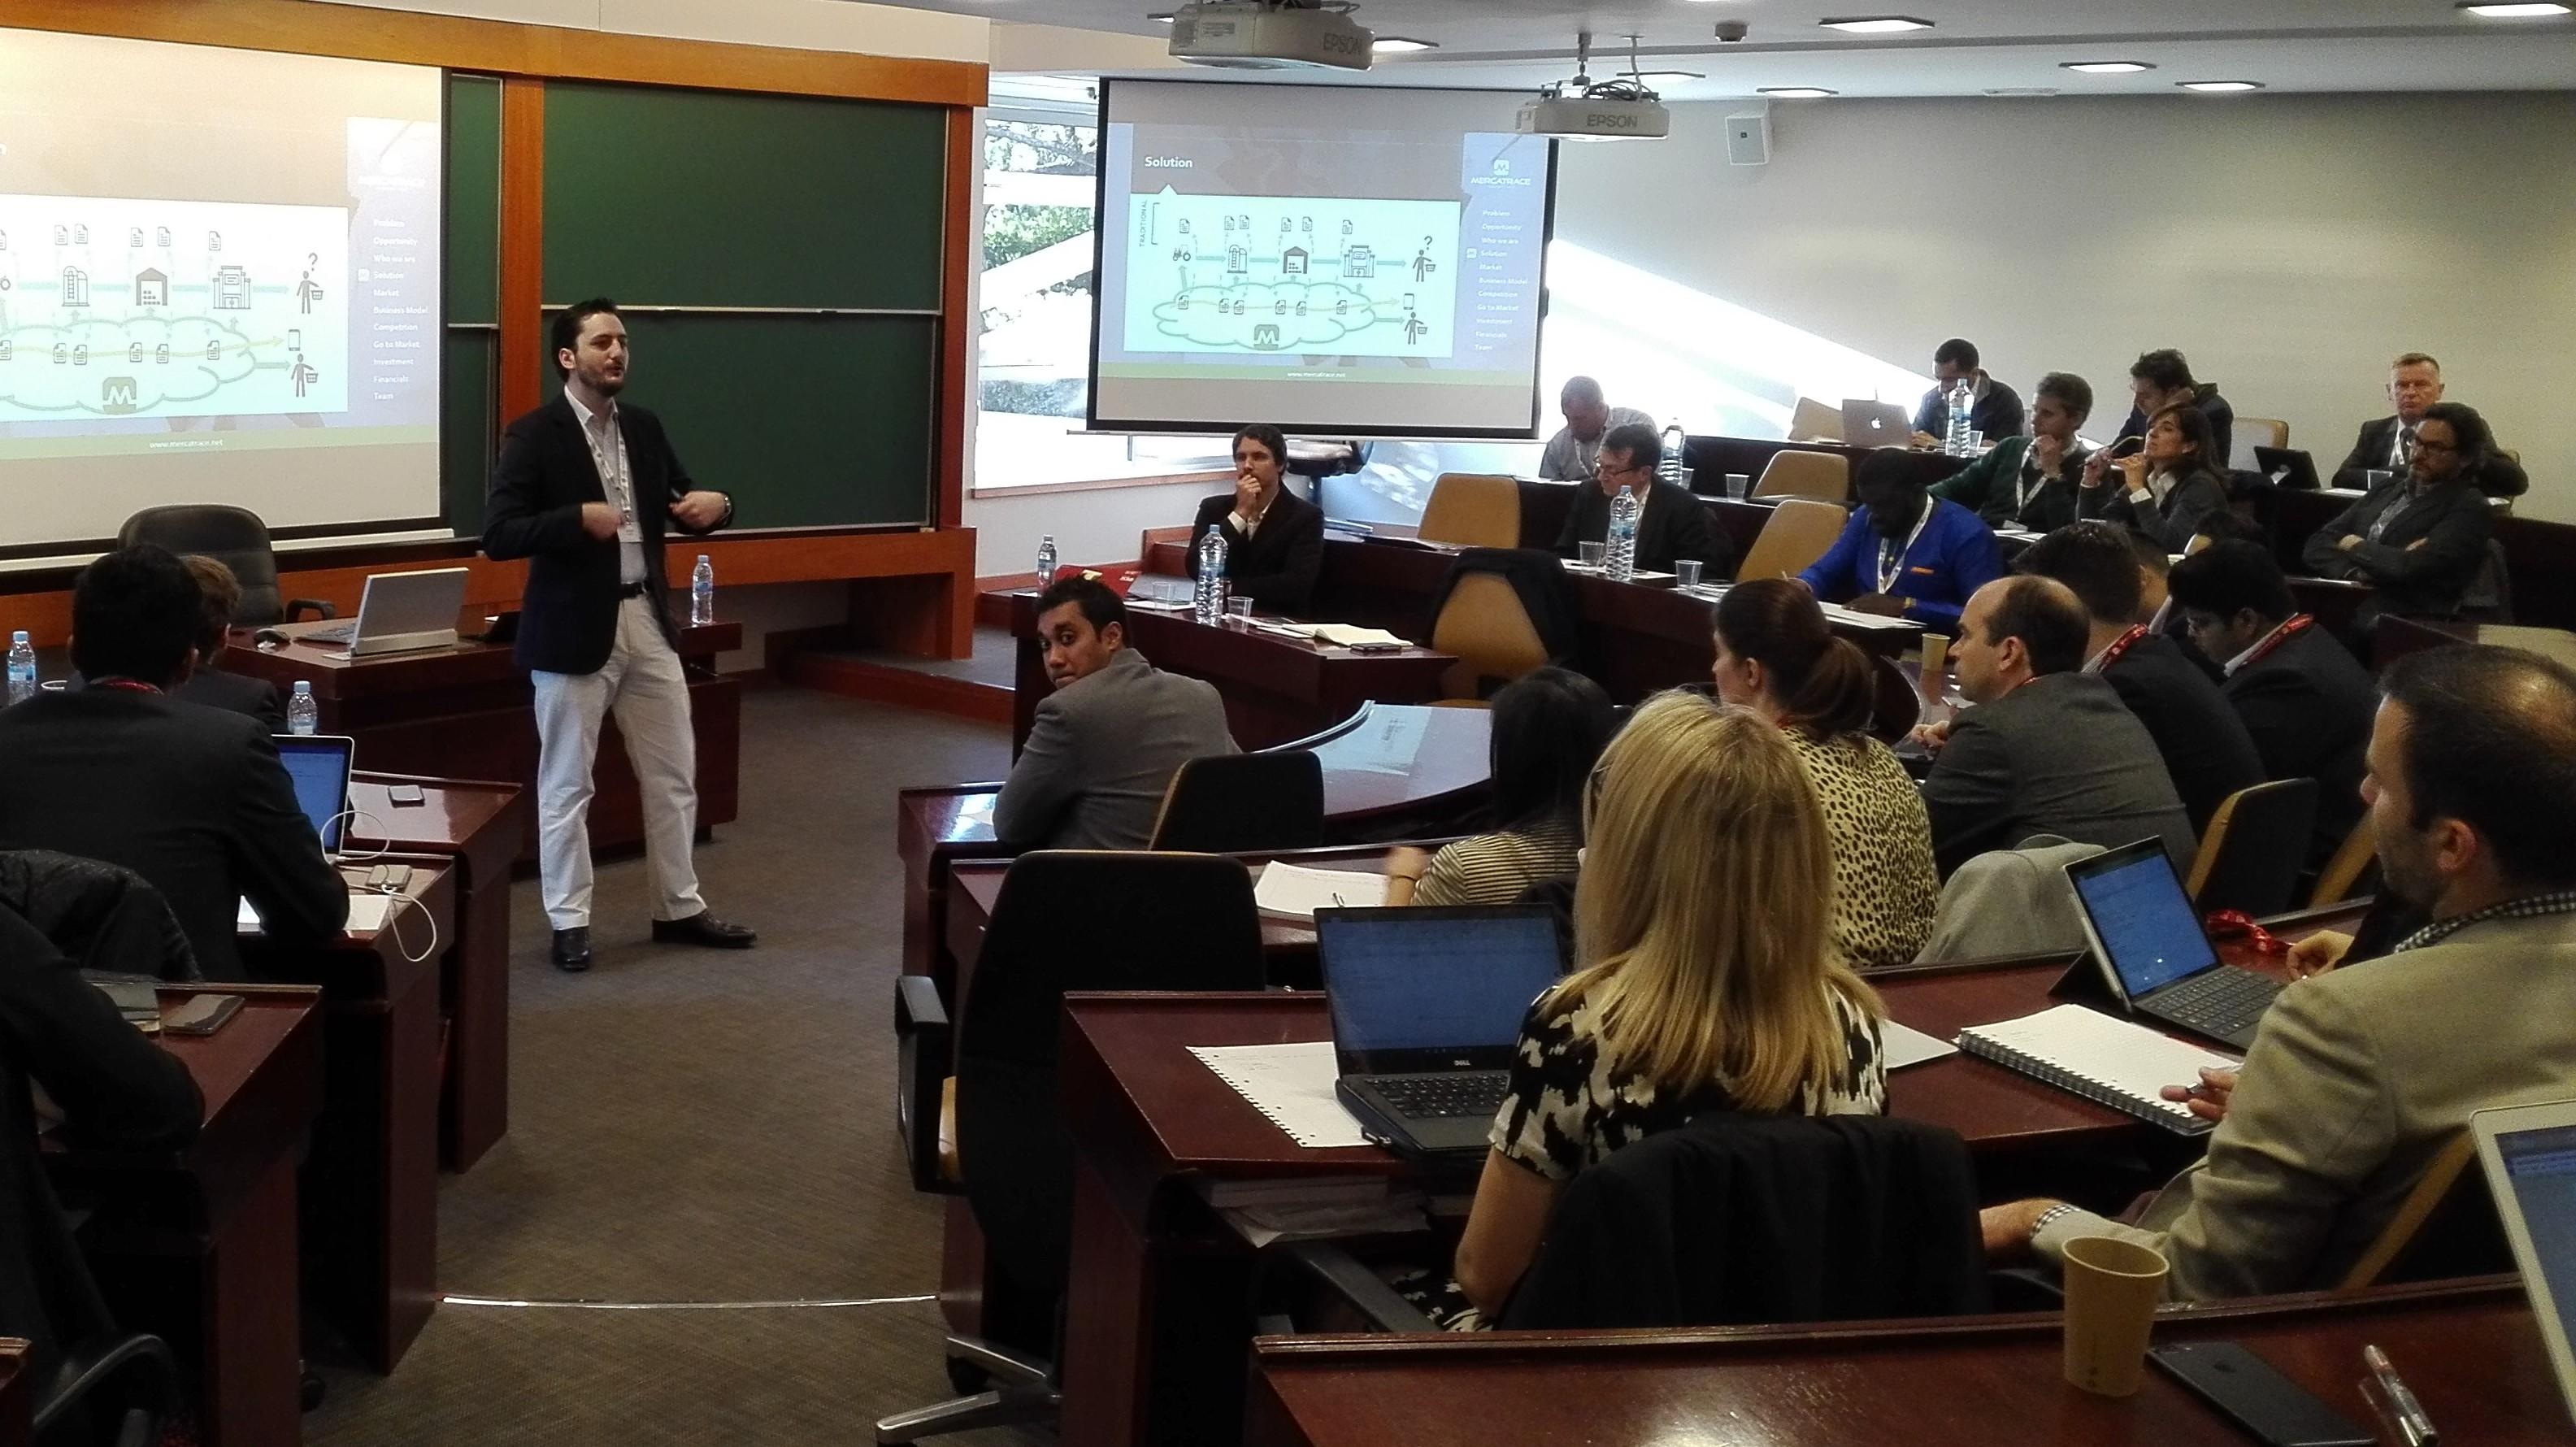 Entrepreneur's presentation